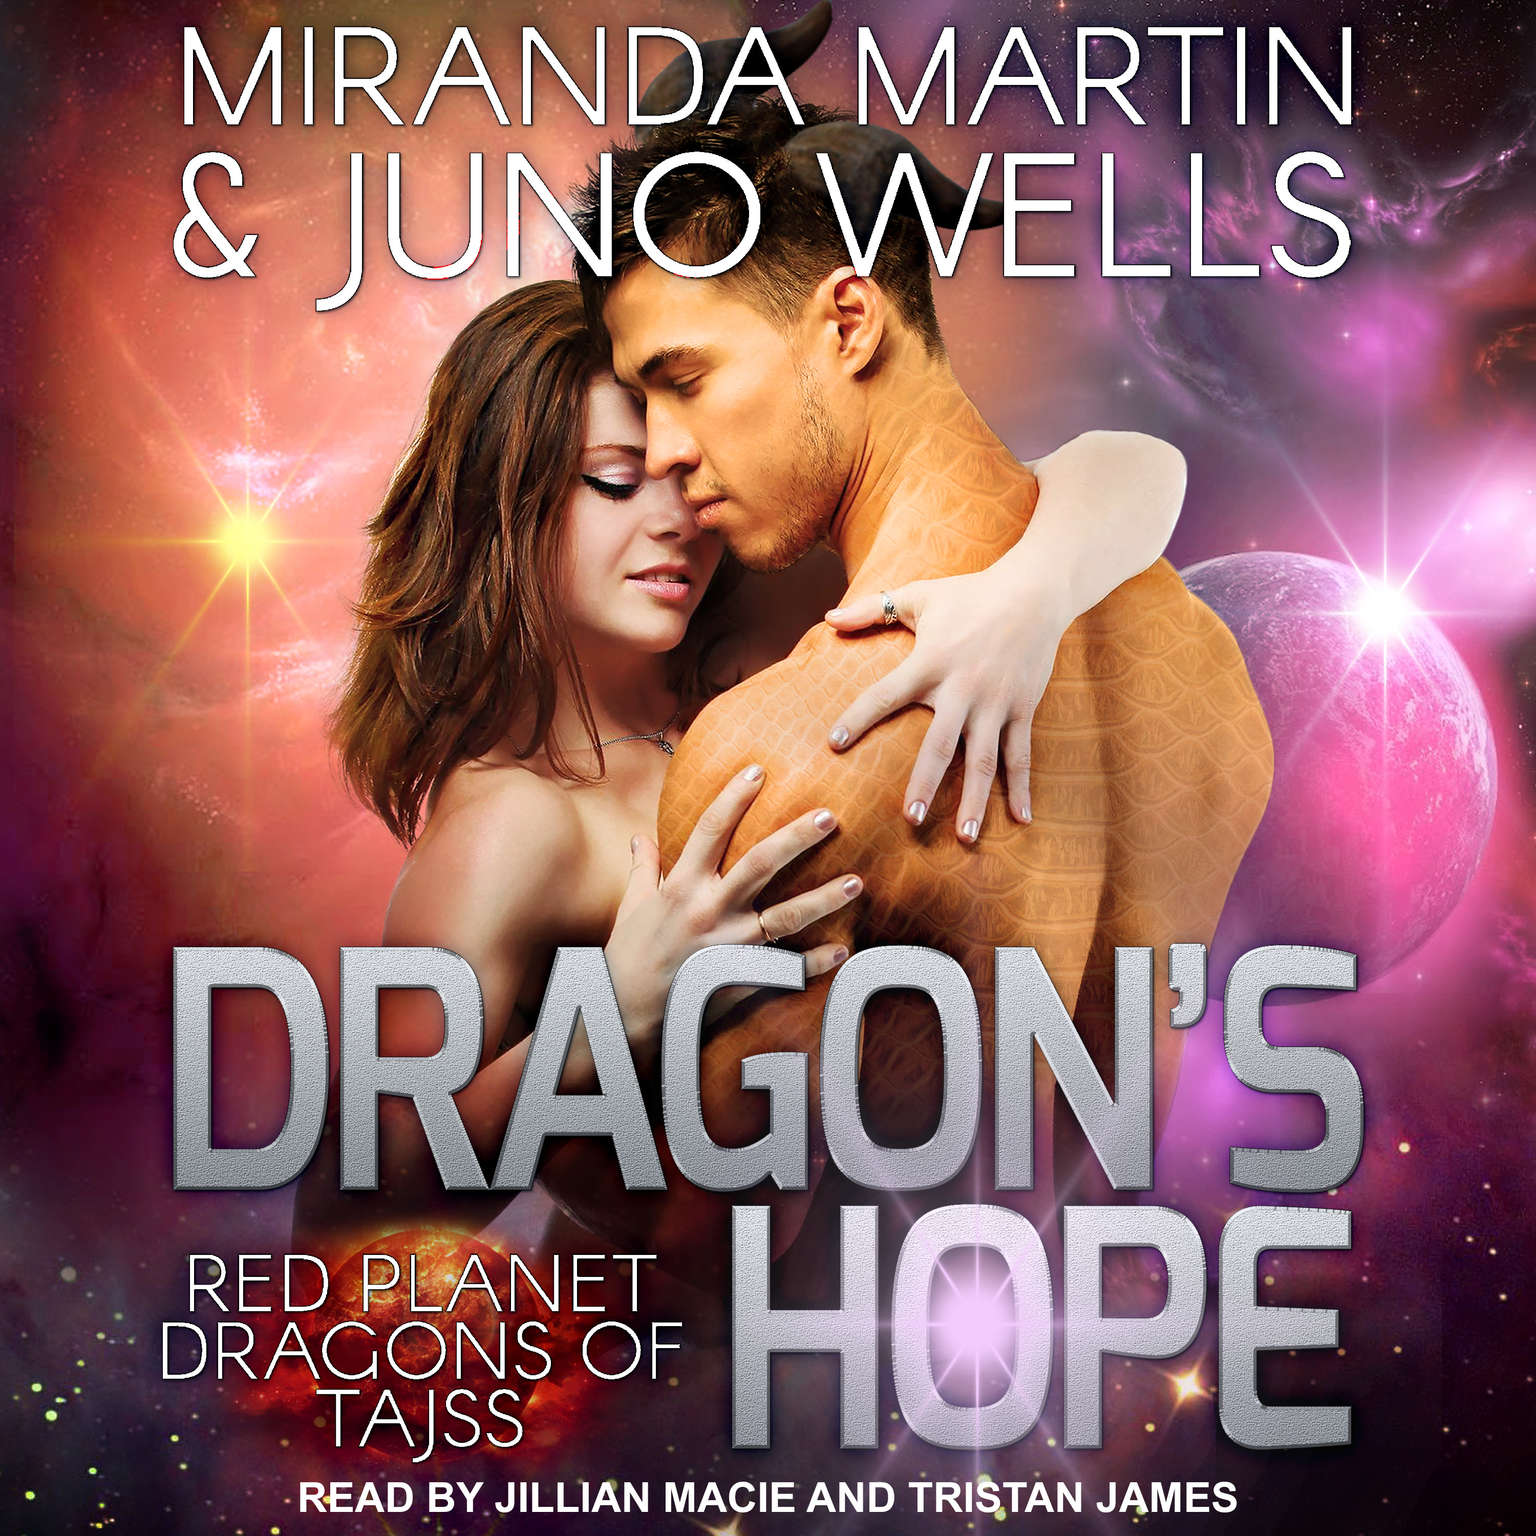 Dragons Hope Audiobook, by Juno Wells